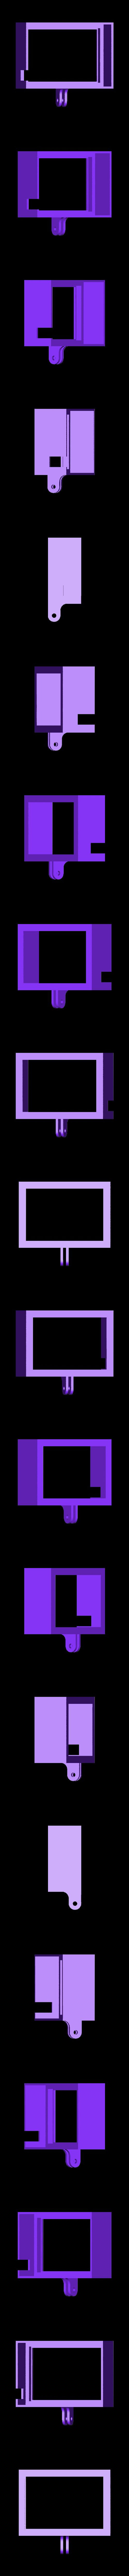 BOITIER.stl Download free STL file Led Panel - Panneau à Led • 3D printing model, Heliox